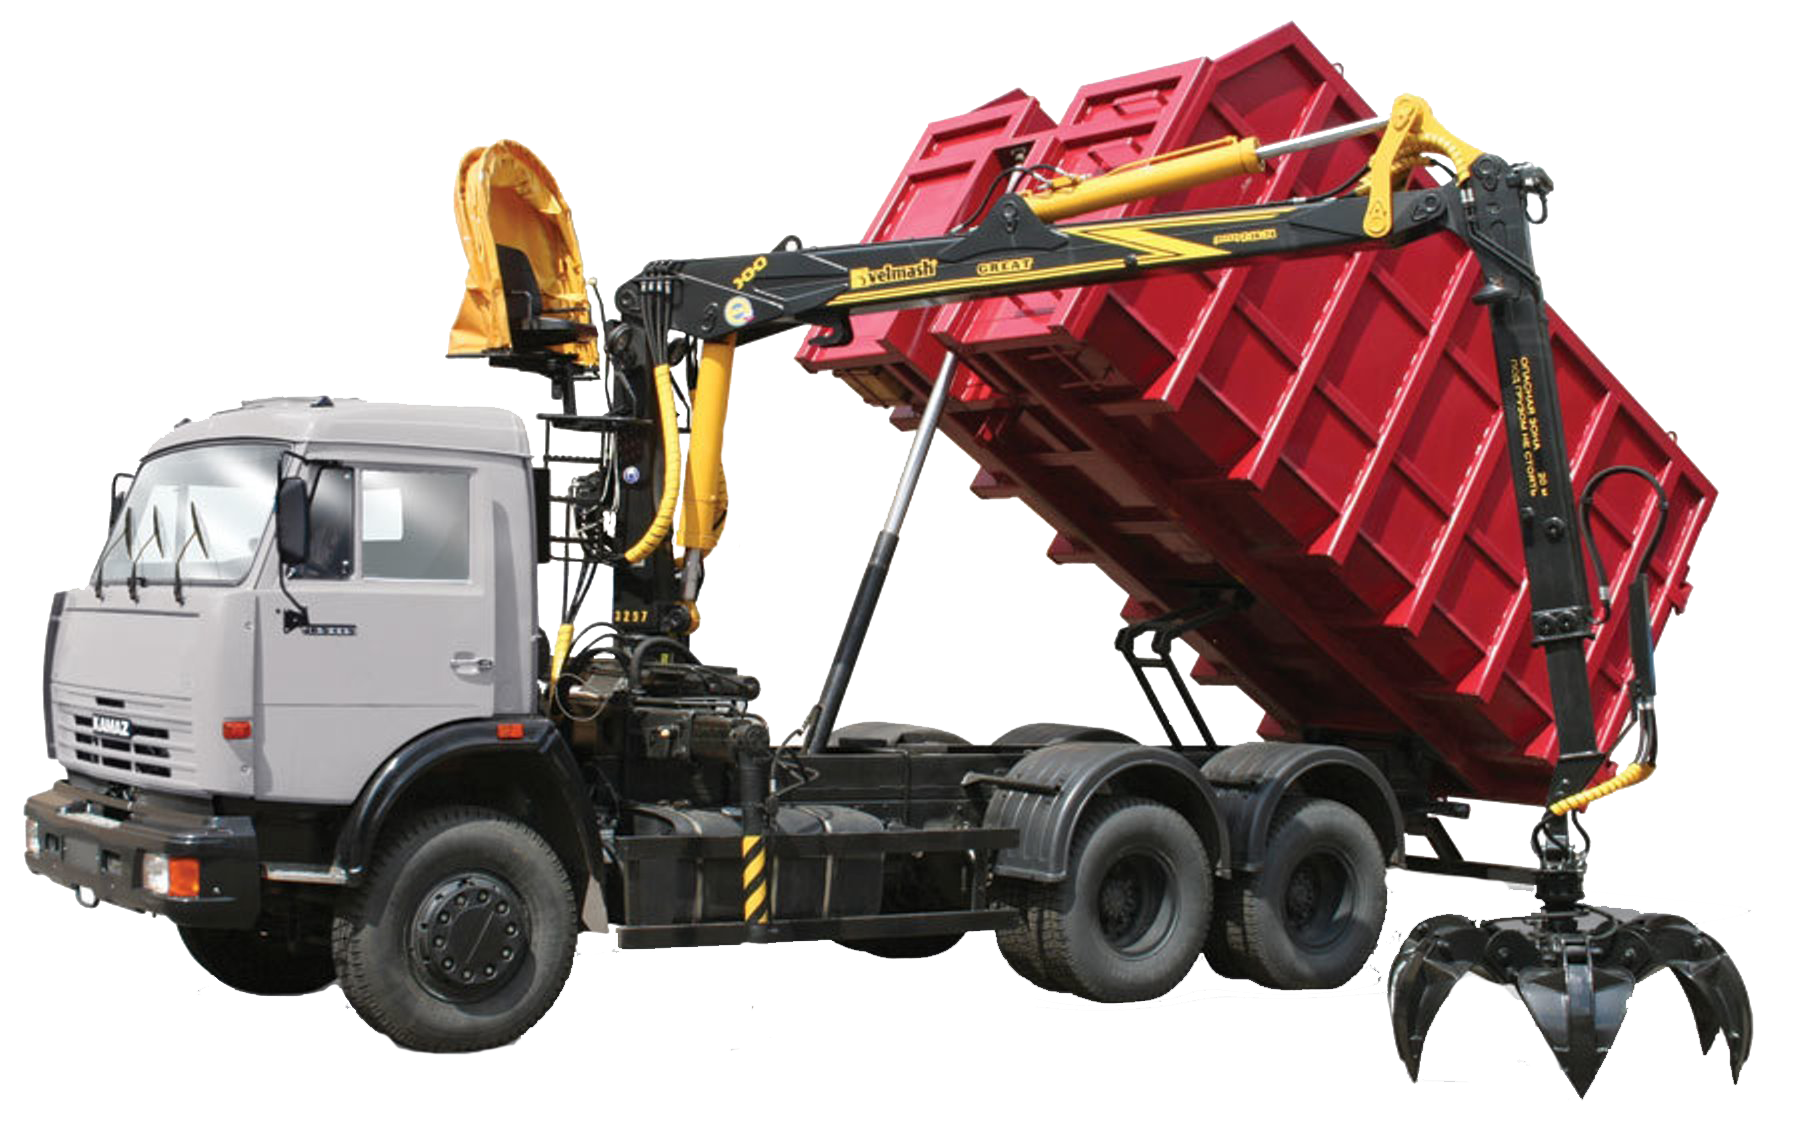 грузовики и спецтехника в украине